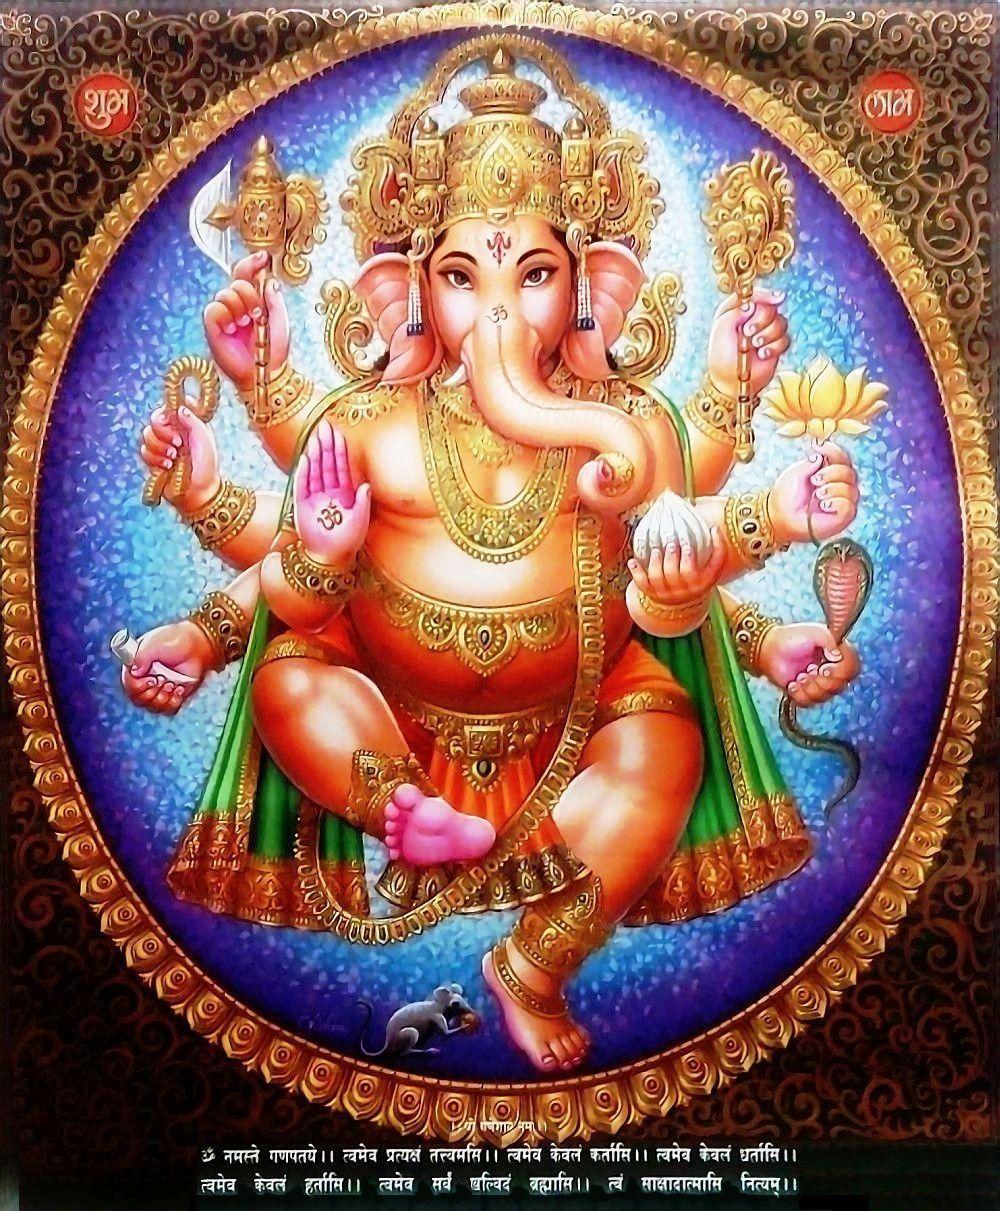 Lord Ganesha 1993 calendar print